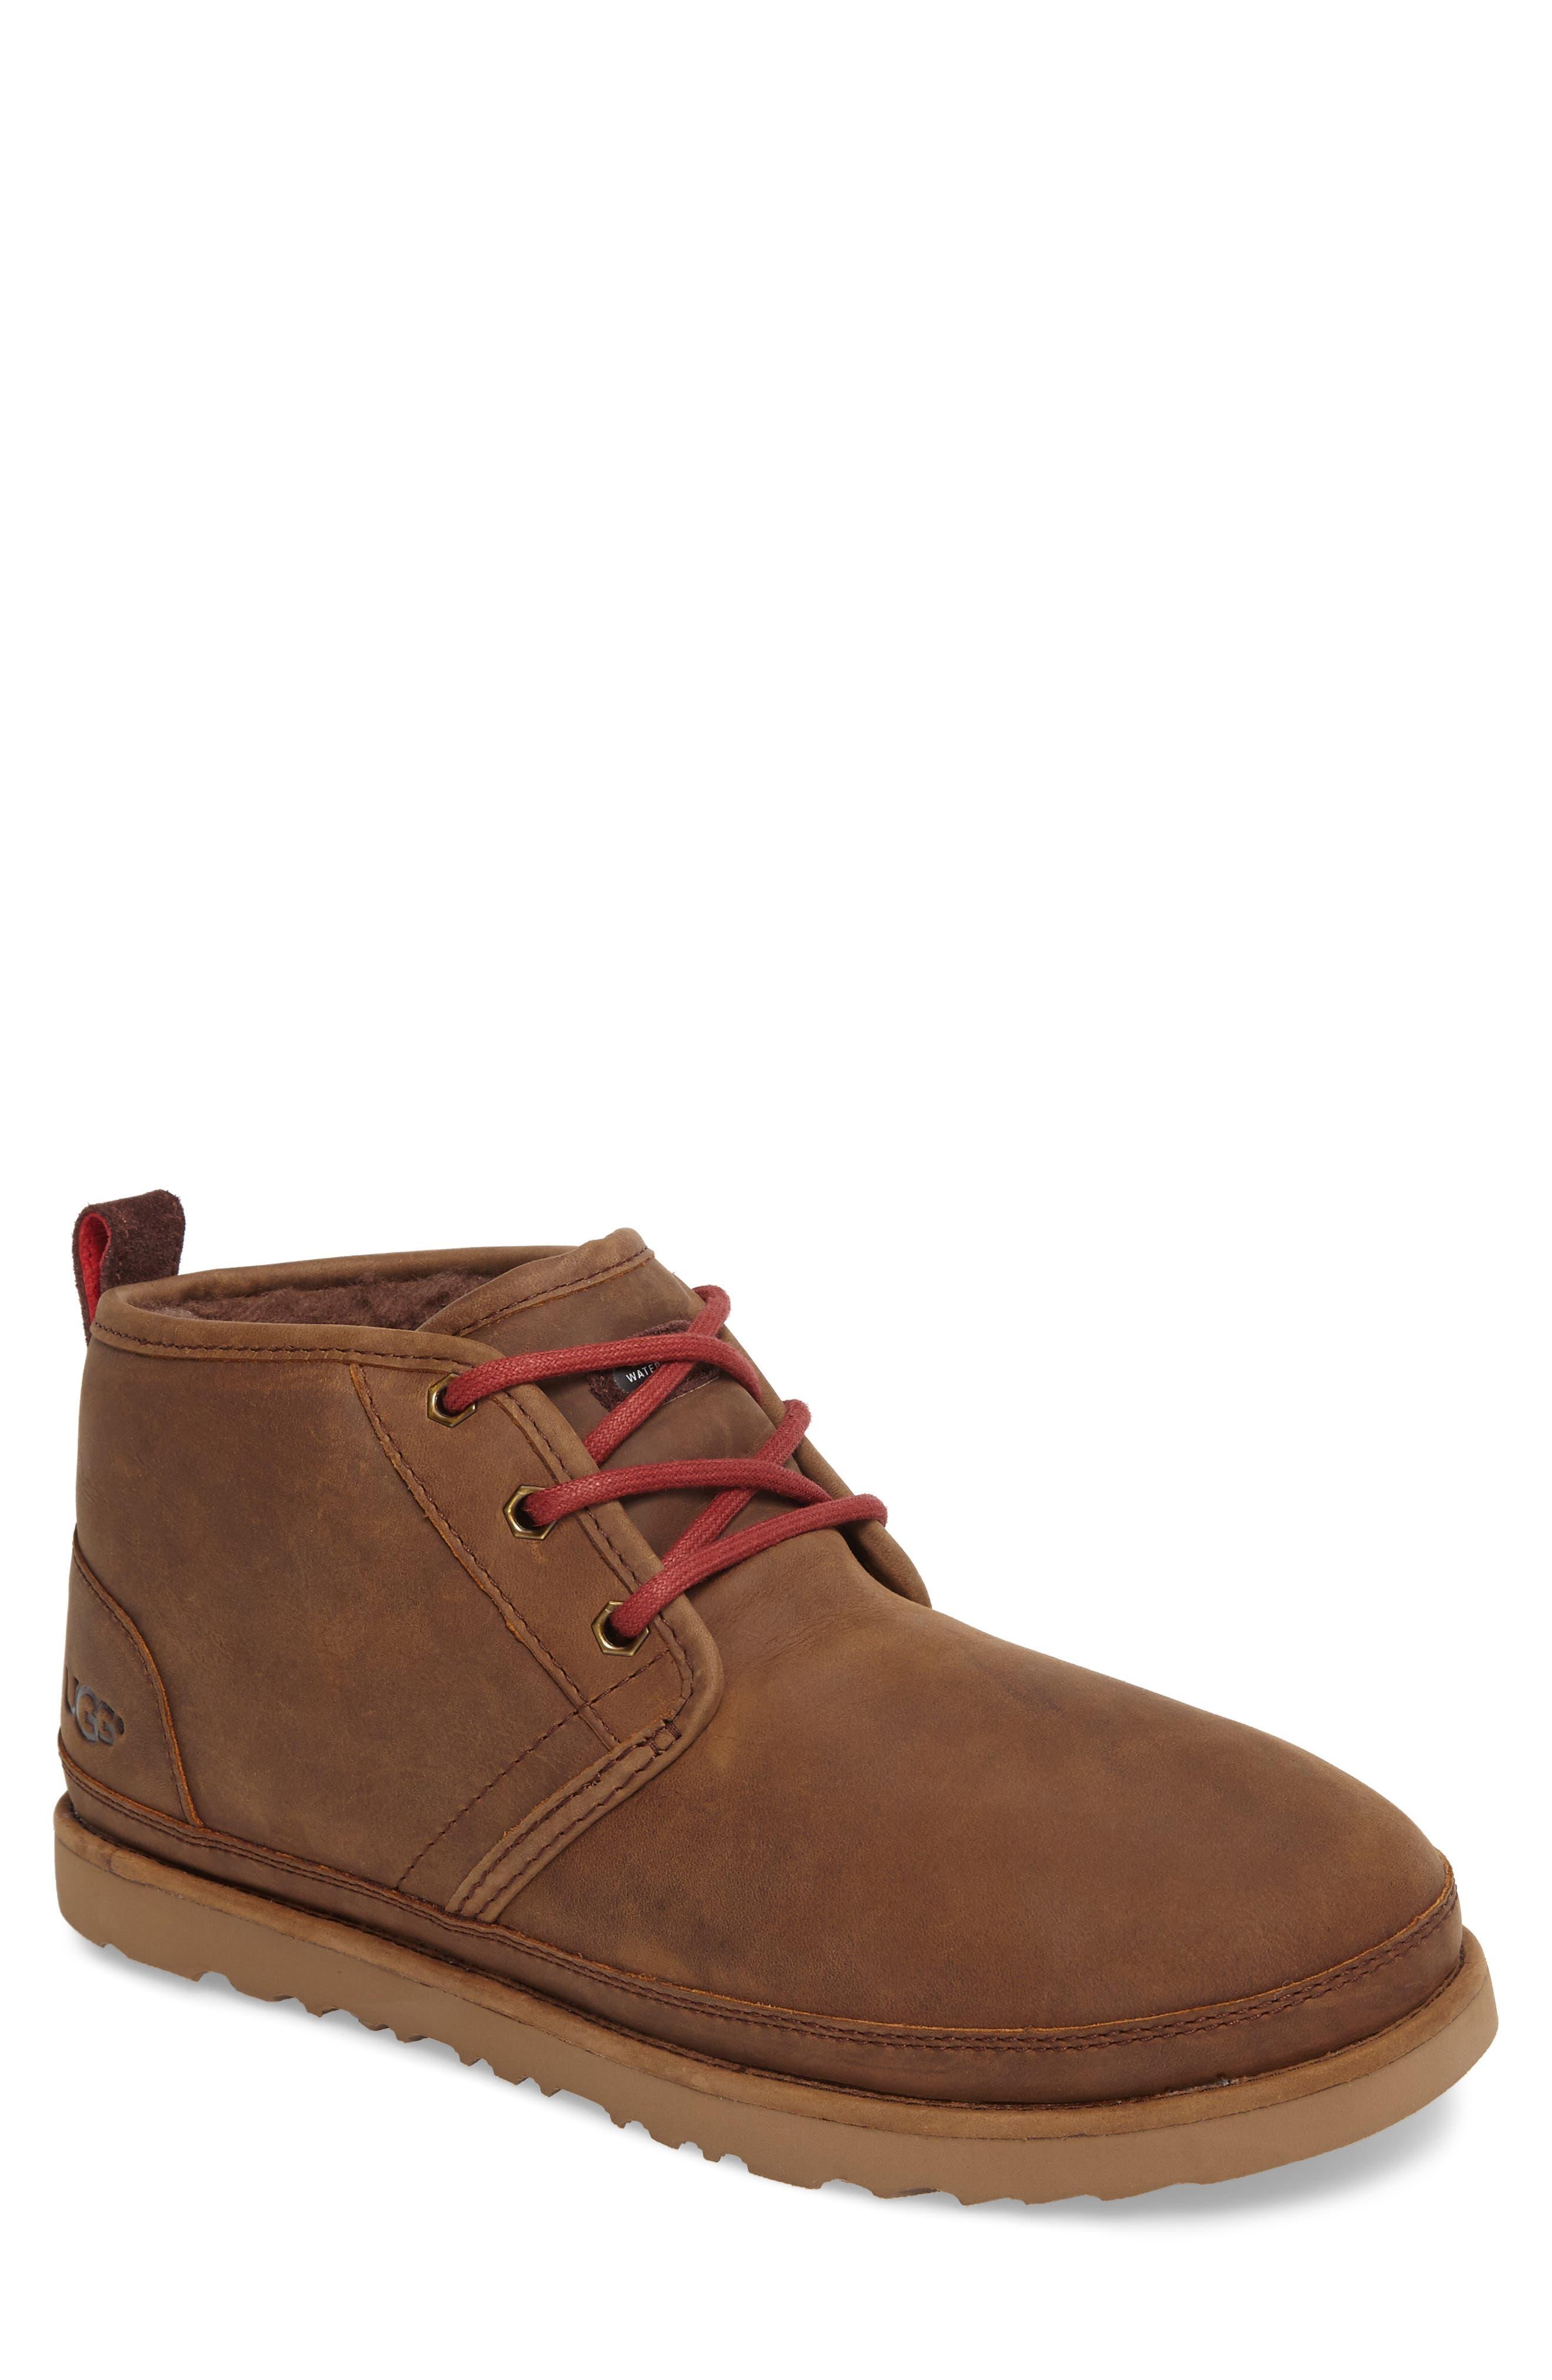 Ugg Neumel Waterproof Chukka Boot, Brown